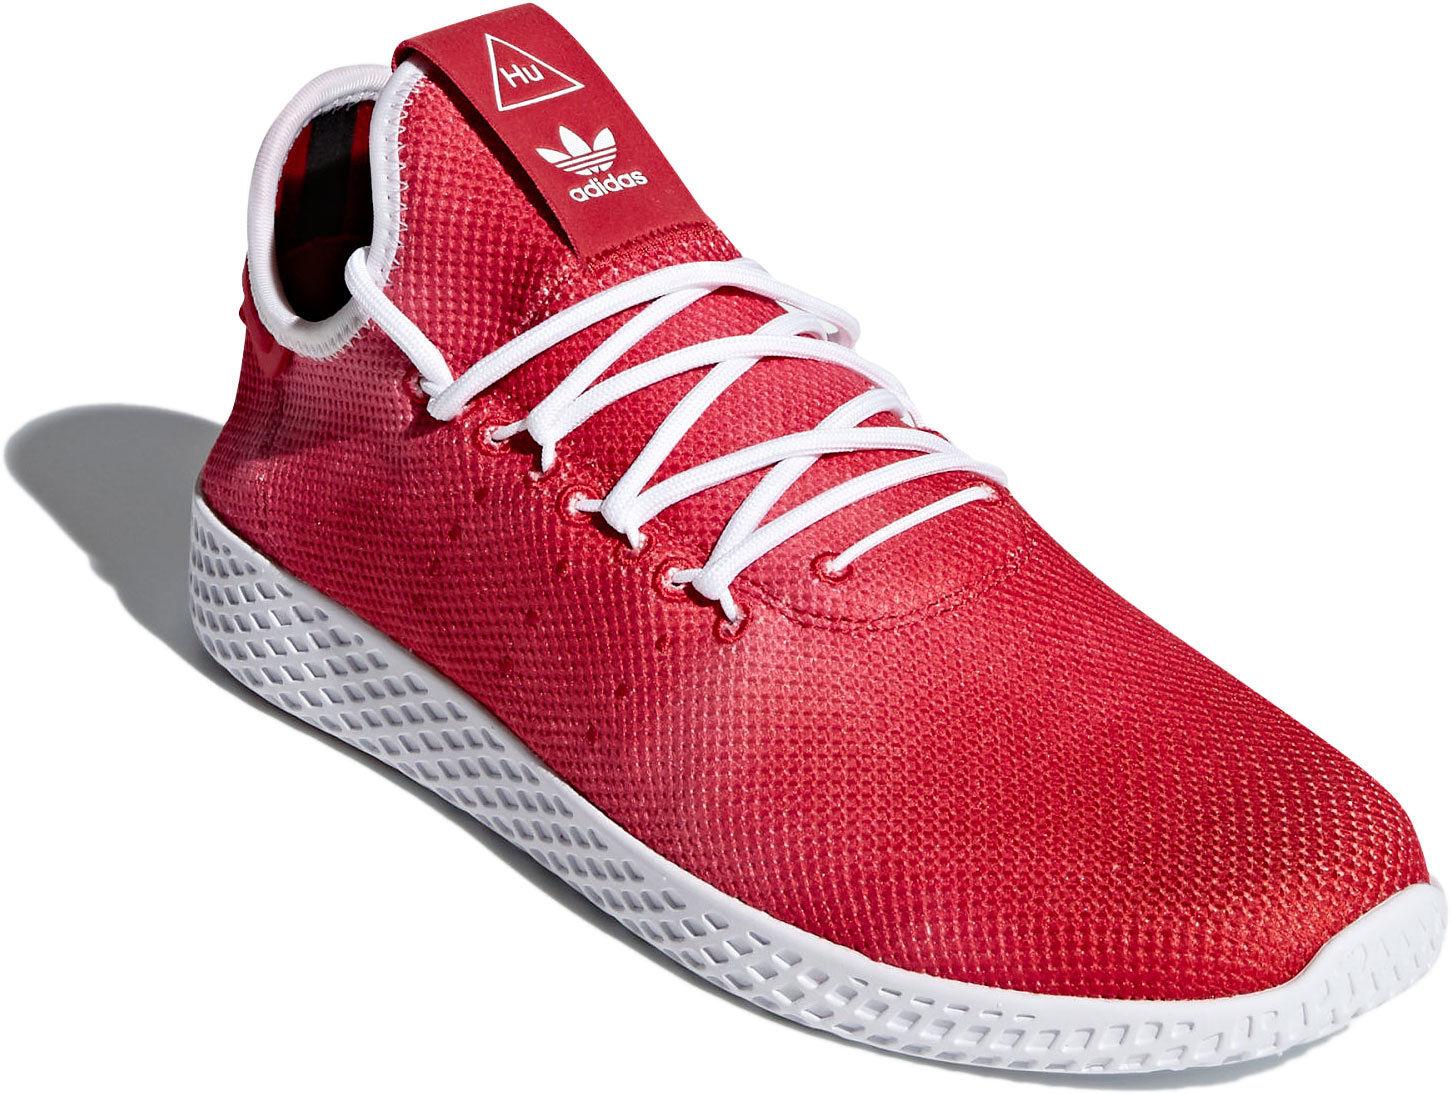 Męskie buty Adidas Pharrell Williams Tennis Hu (8 kolorów